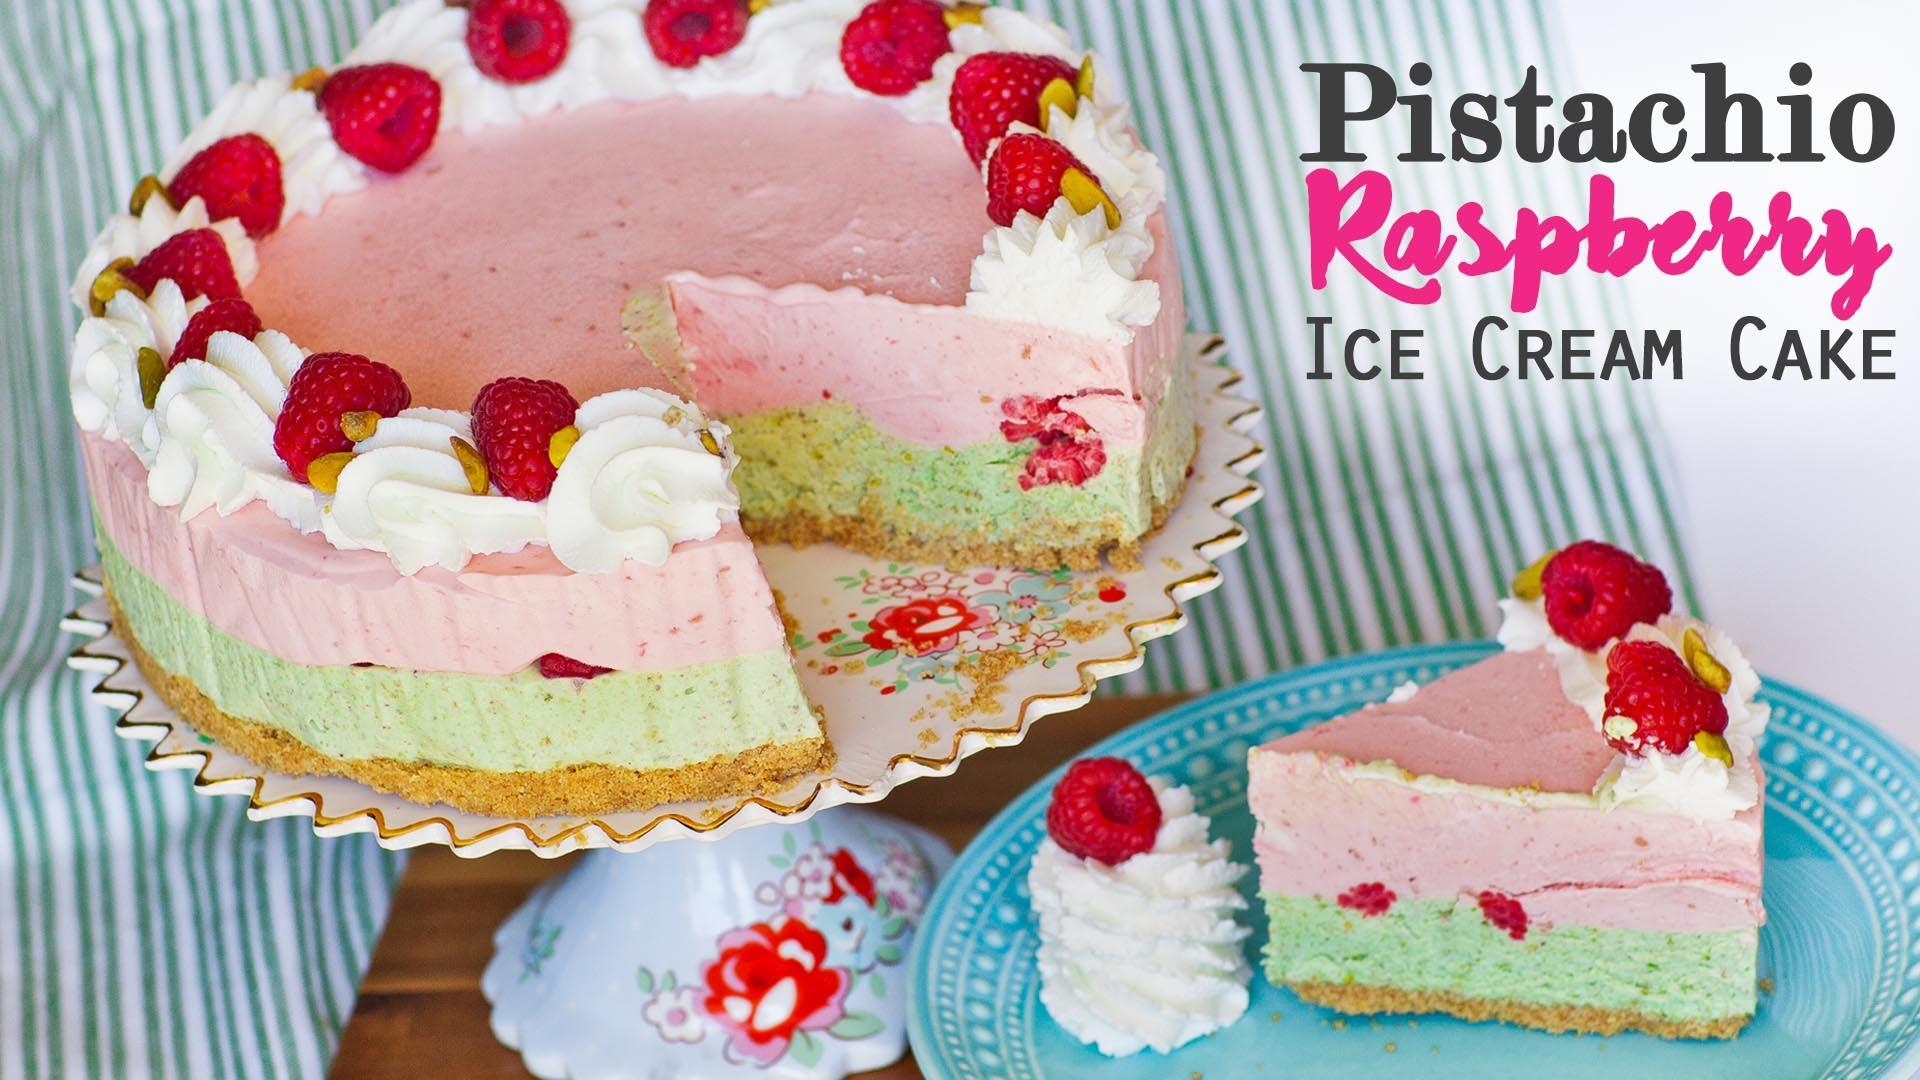 Make A Pistachio Raspberry Ice Cream Cake With No Machine